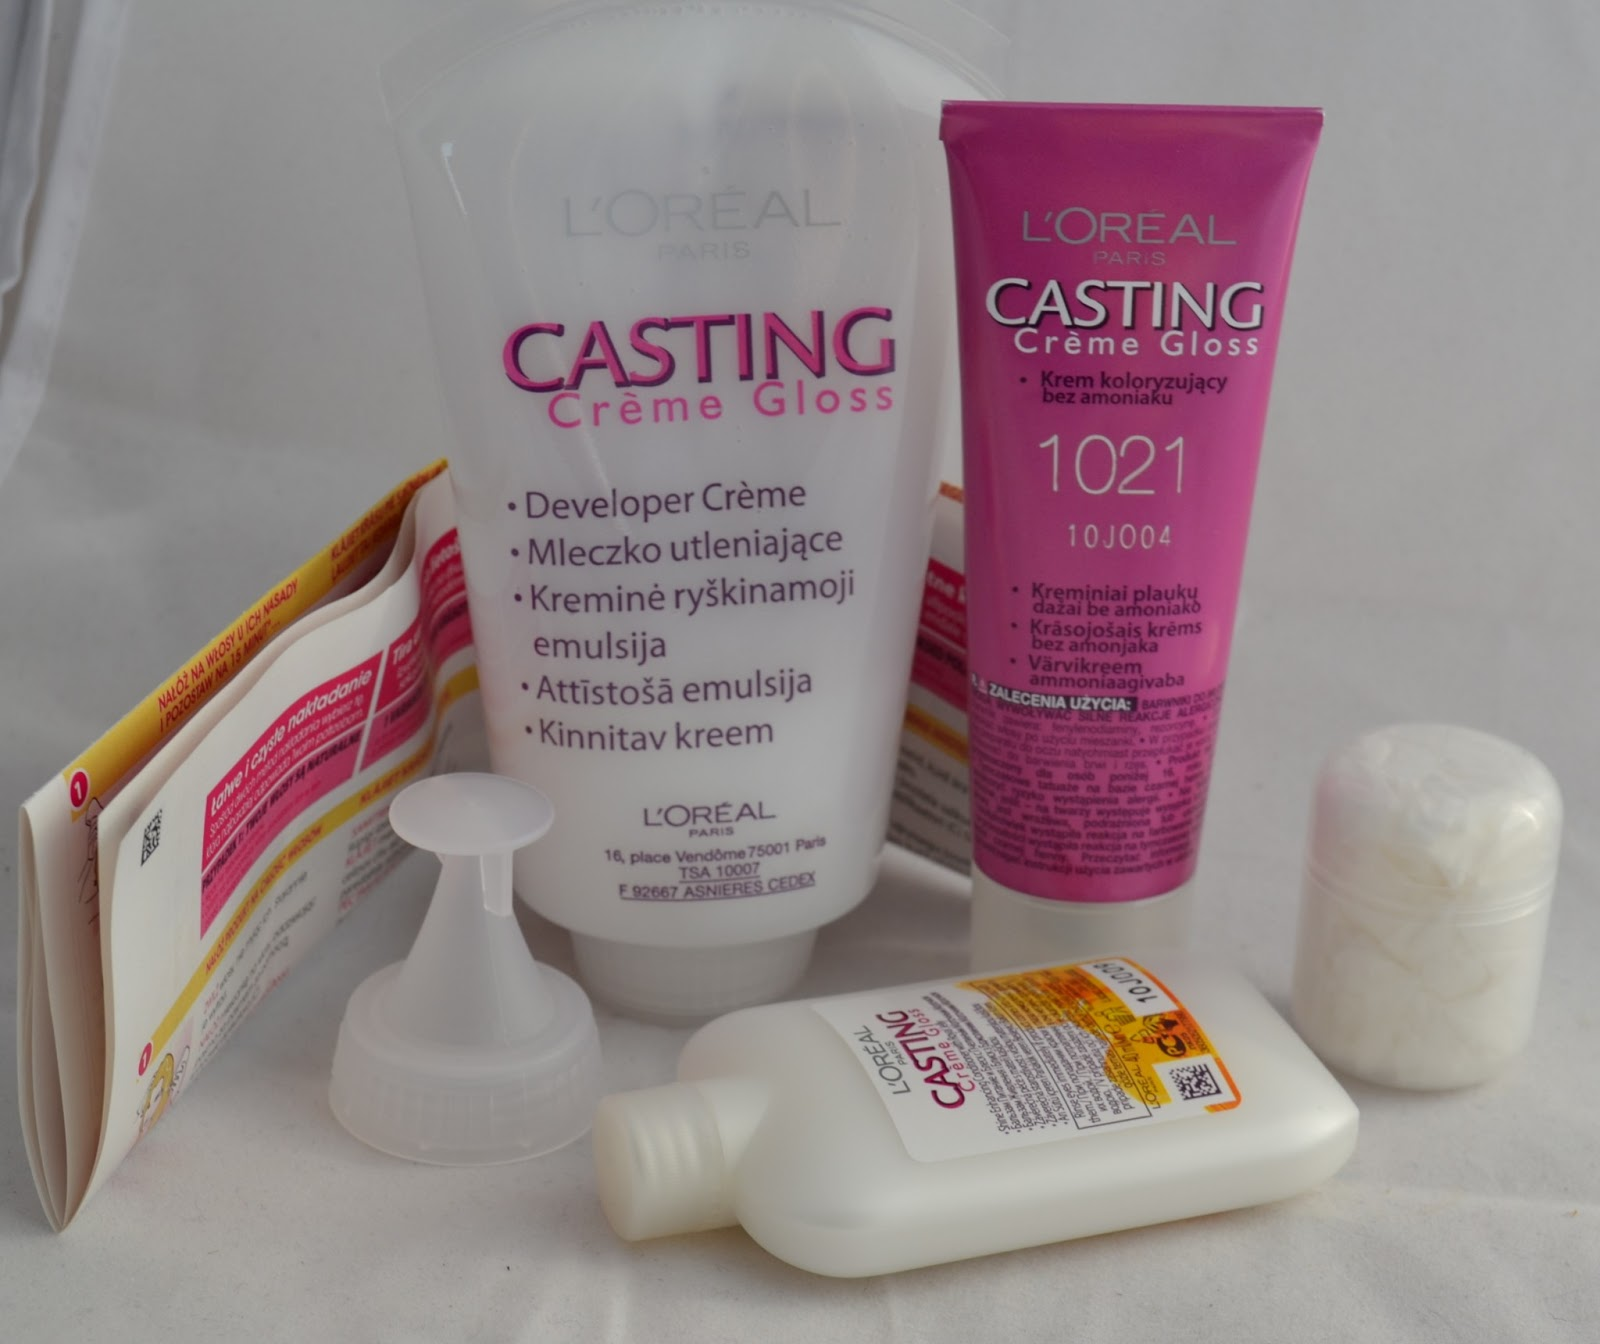 developer creme, dye, shine enhancing conditioner, gloves, instructions